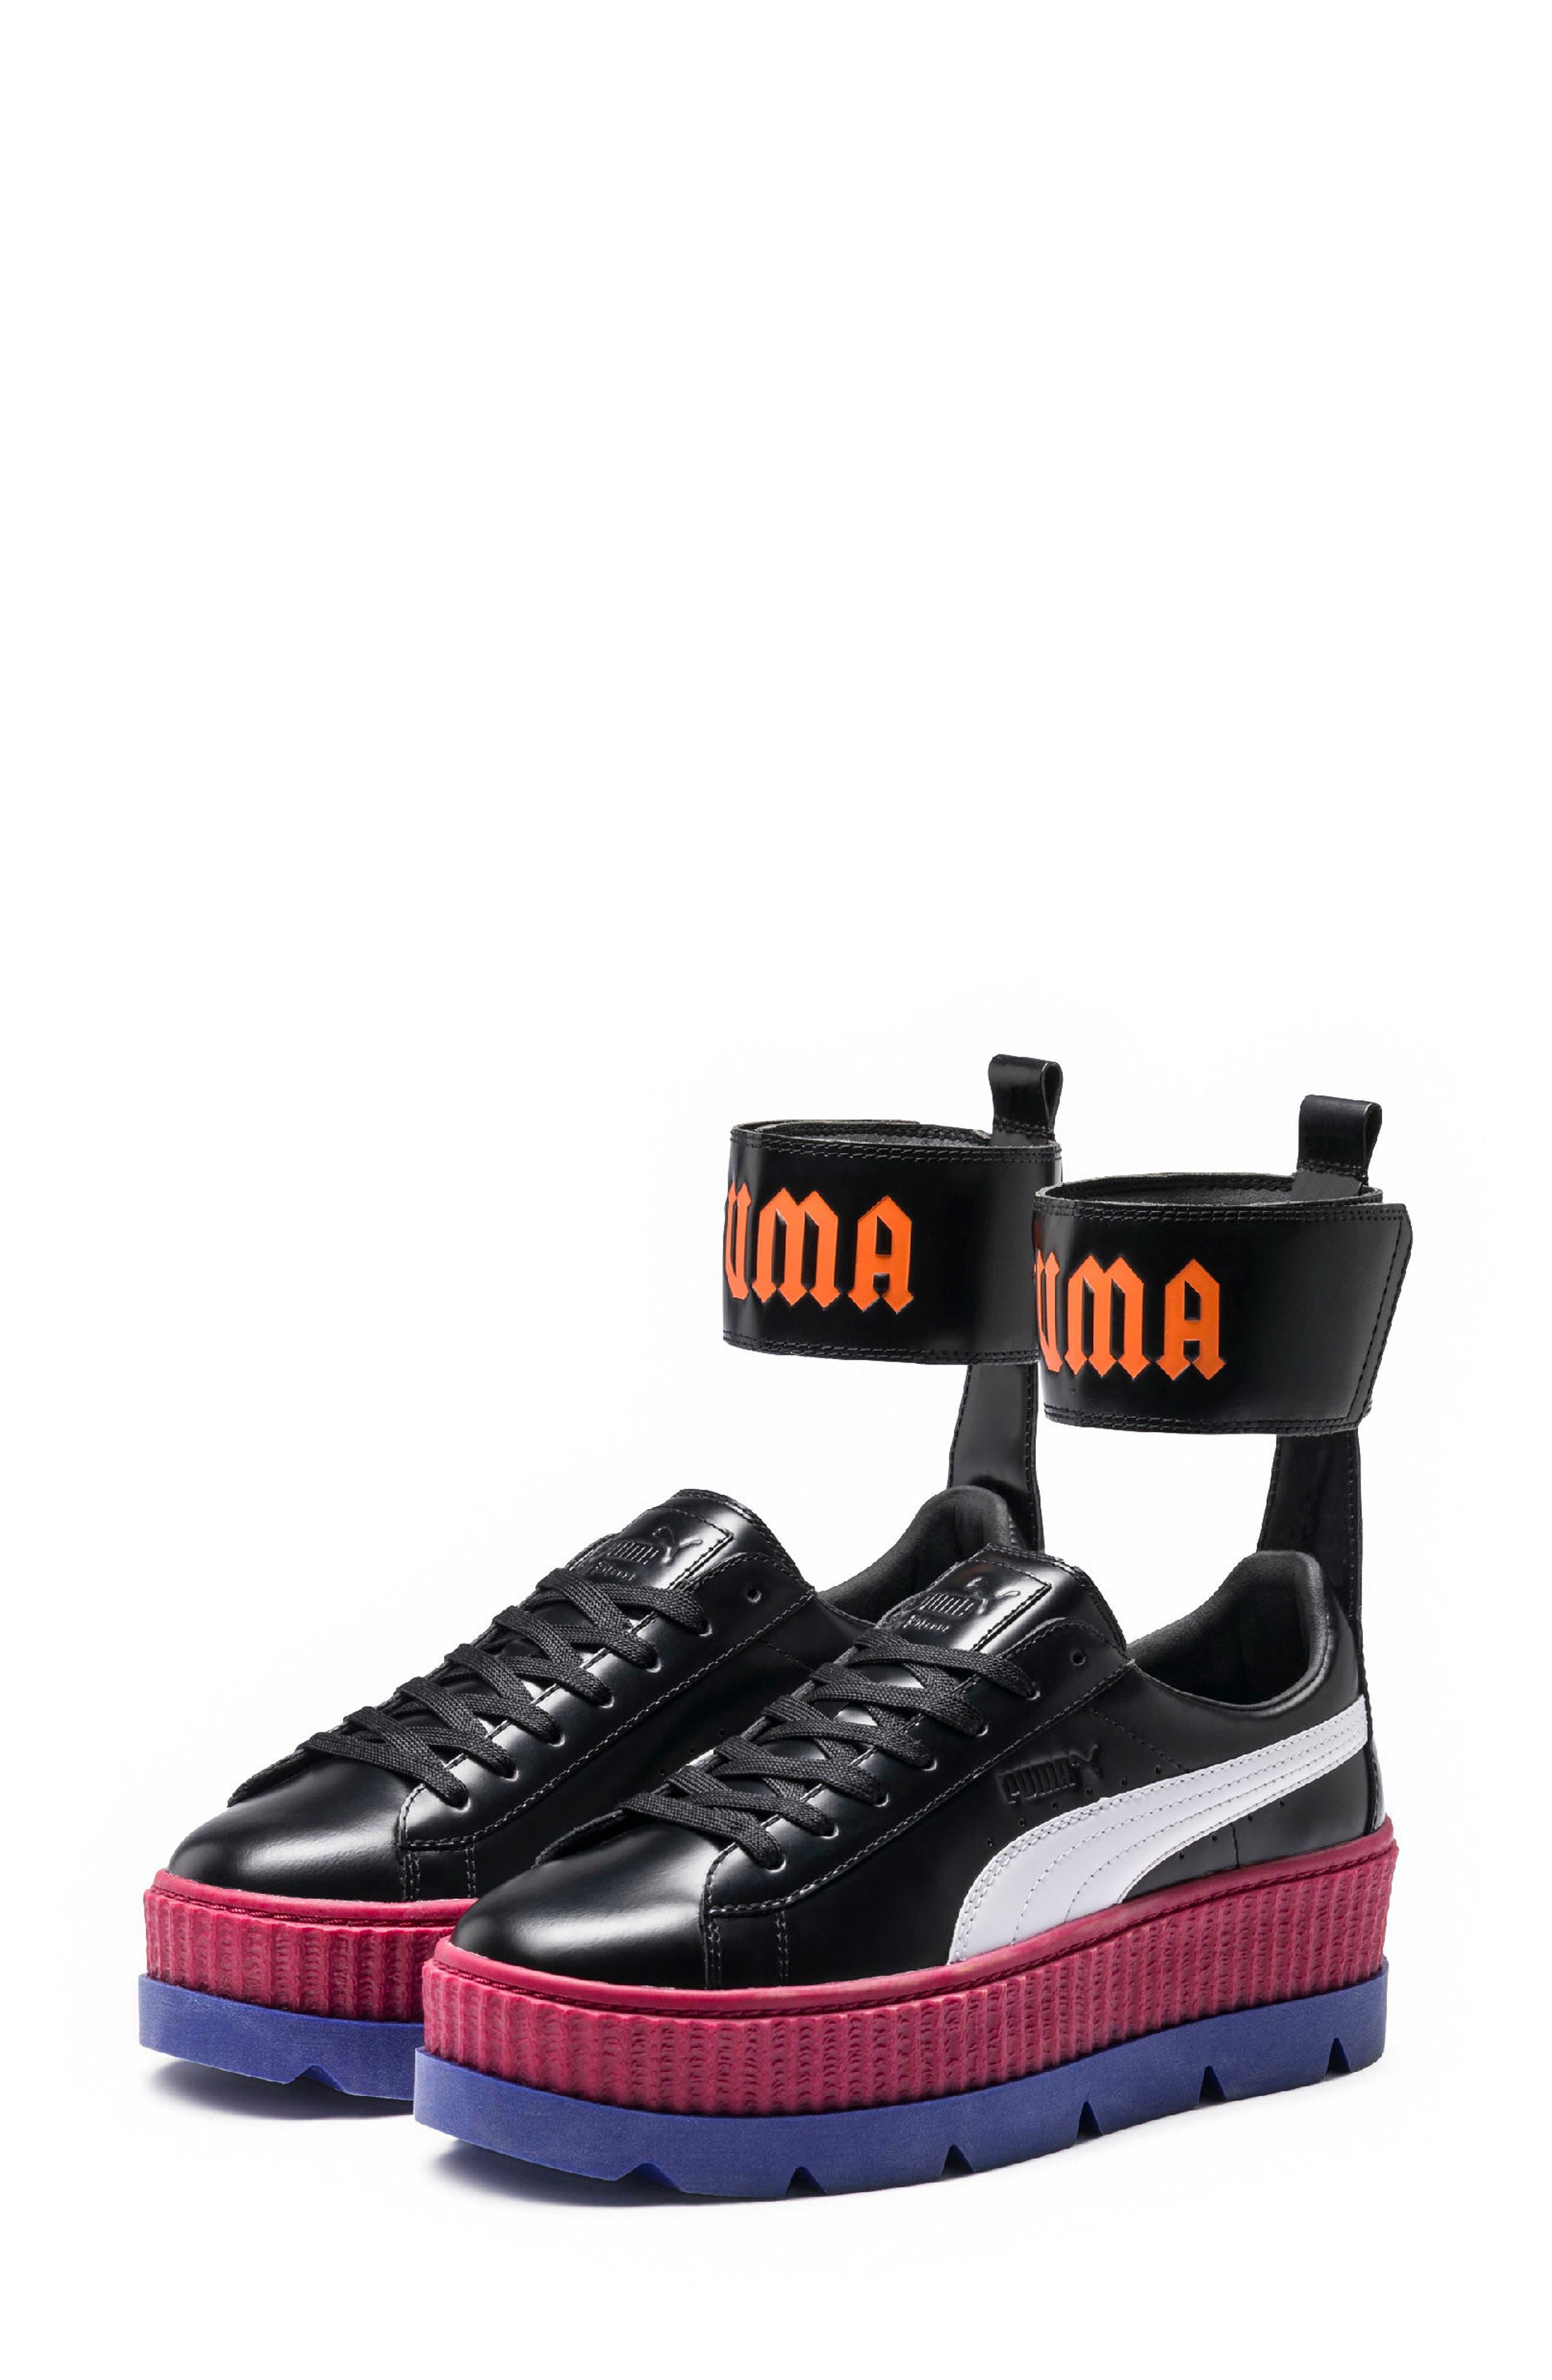 FENTY PUMA by Rihanna Ankle Strap Creeper Sneaker,                             Alternate thumbnail 2, color,                             001